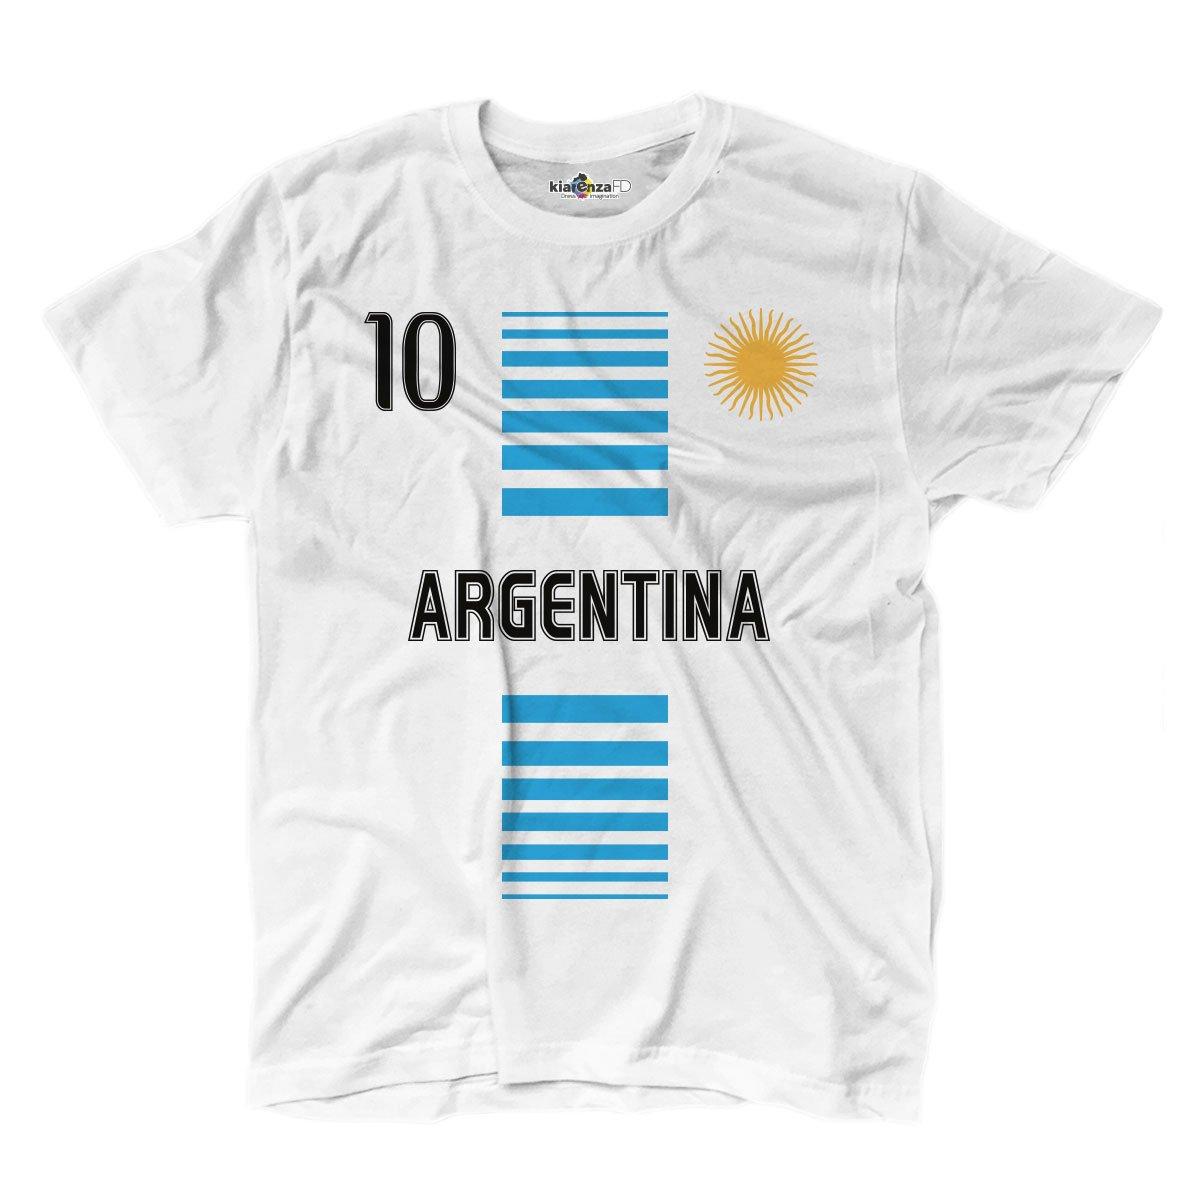 KiarenzaFD T-Shirt Hommes National Sportif Argentina Argentine 10 Sole Football Sport 1 Streetwear Shirts